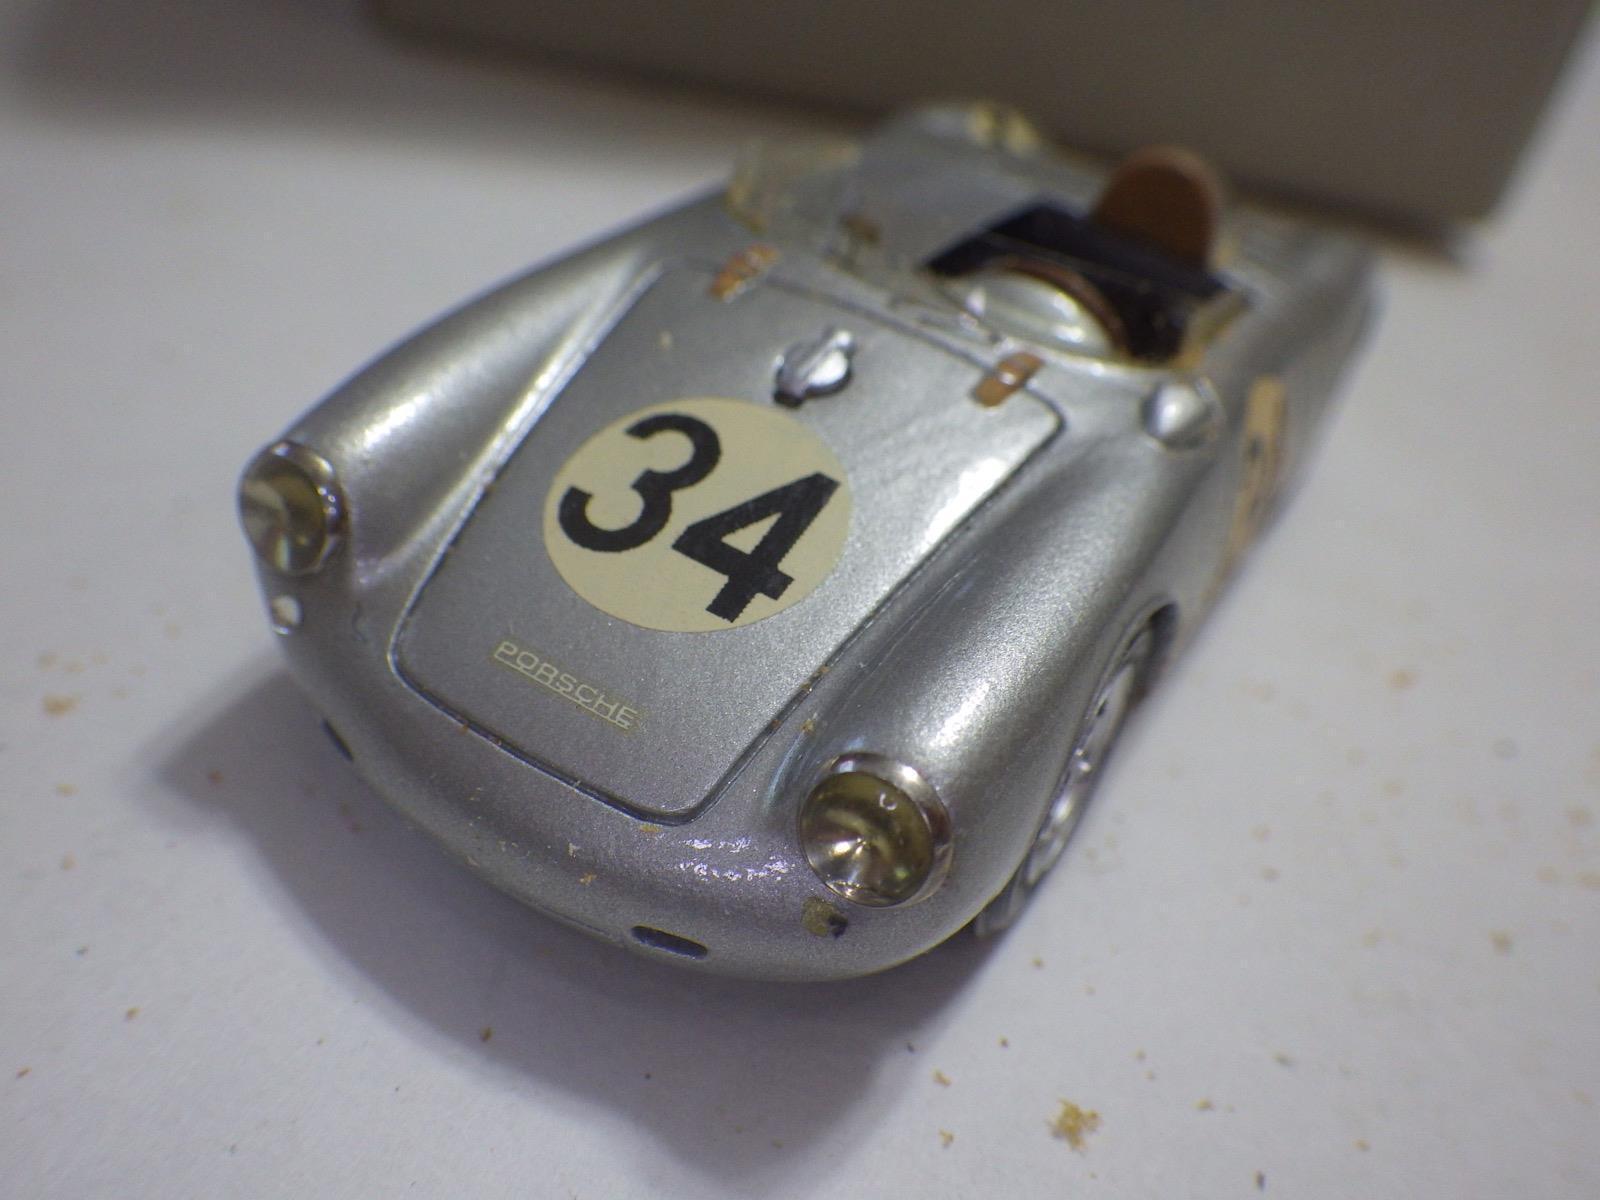 buena reputación M.d.l. (Italia) Plata Porsche 550RS Spyder construida a a a mano Resina 1 43 Nuevo En Caja  producto de calidad